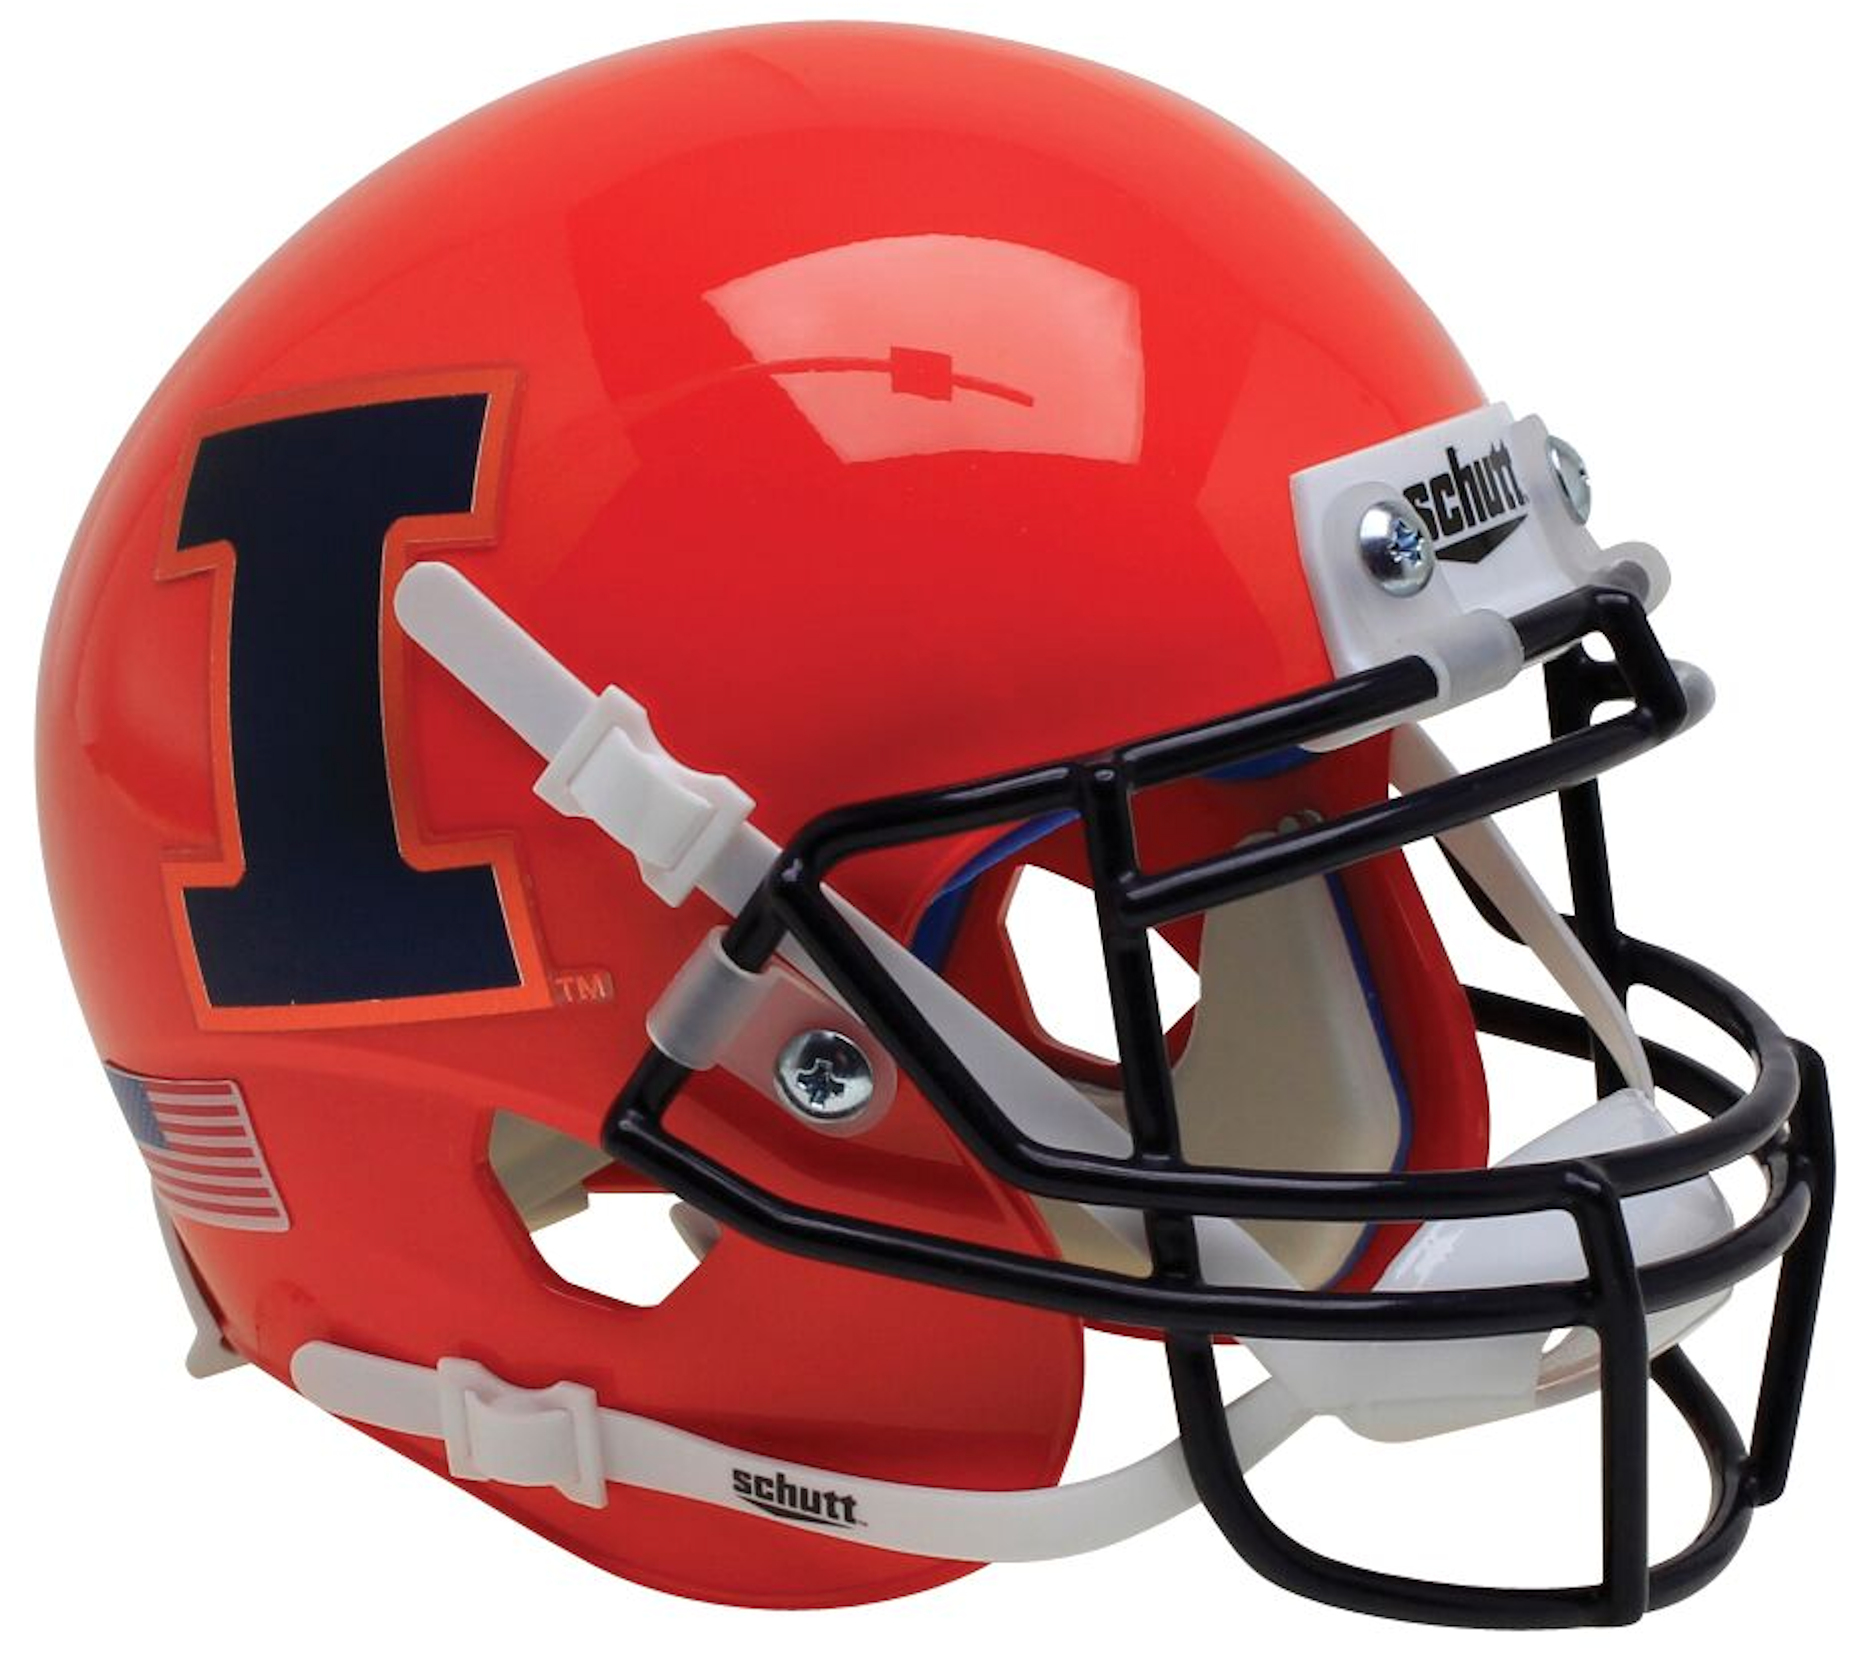 Illinois Fighting Illini Authentic College XP Football Helmet Schutt <B>Orange</B>